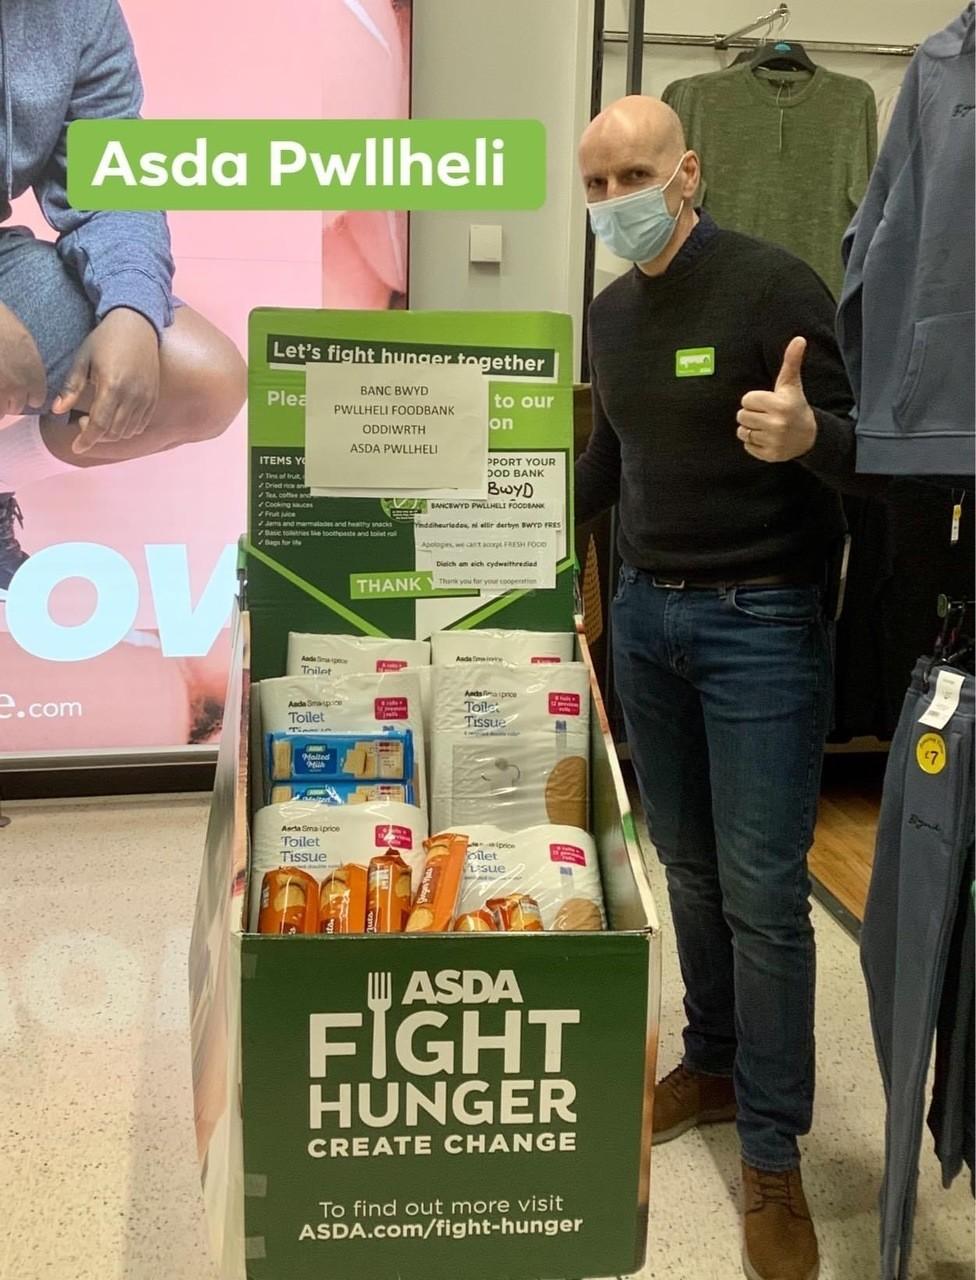 Fight Hunger | Asda Pwllheli